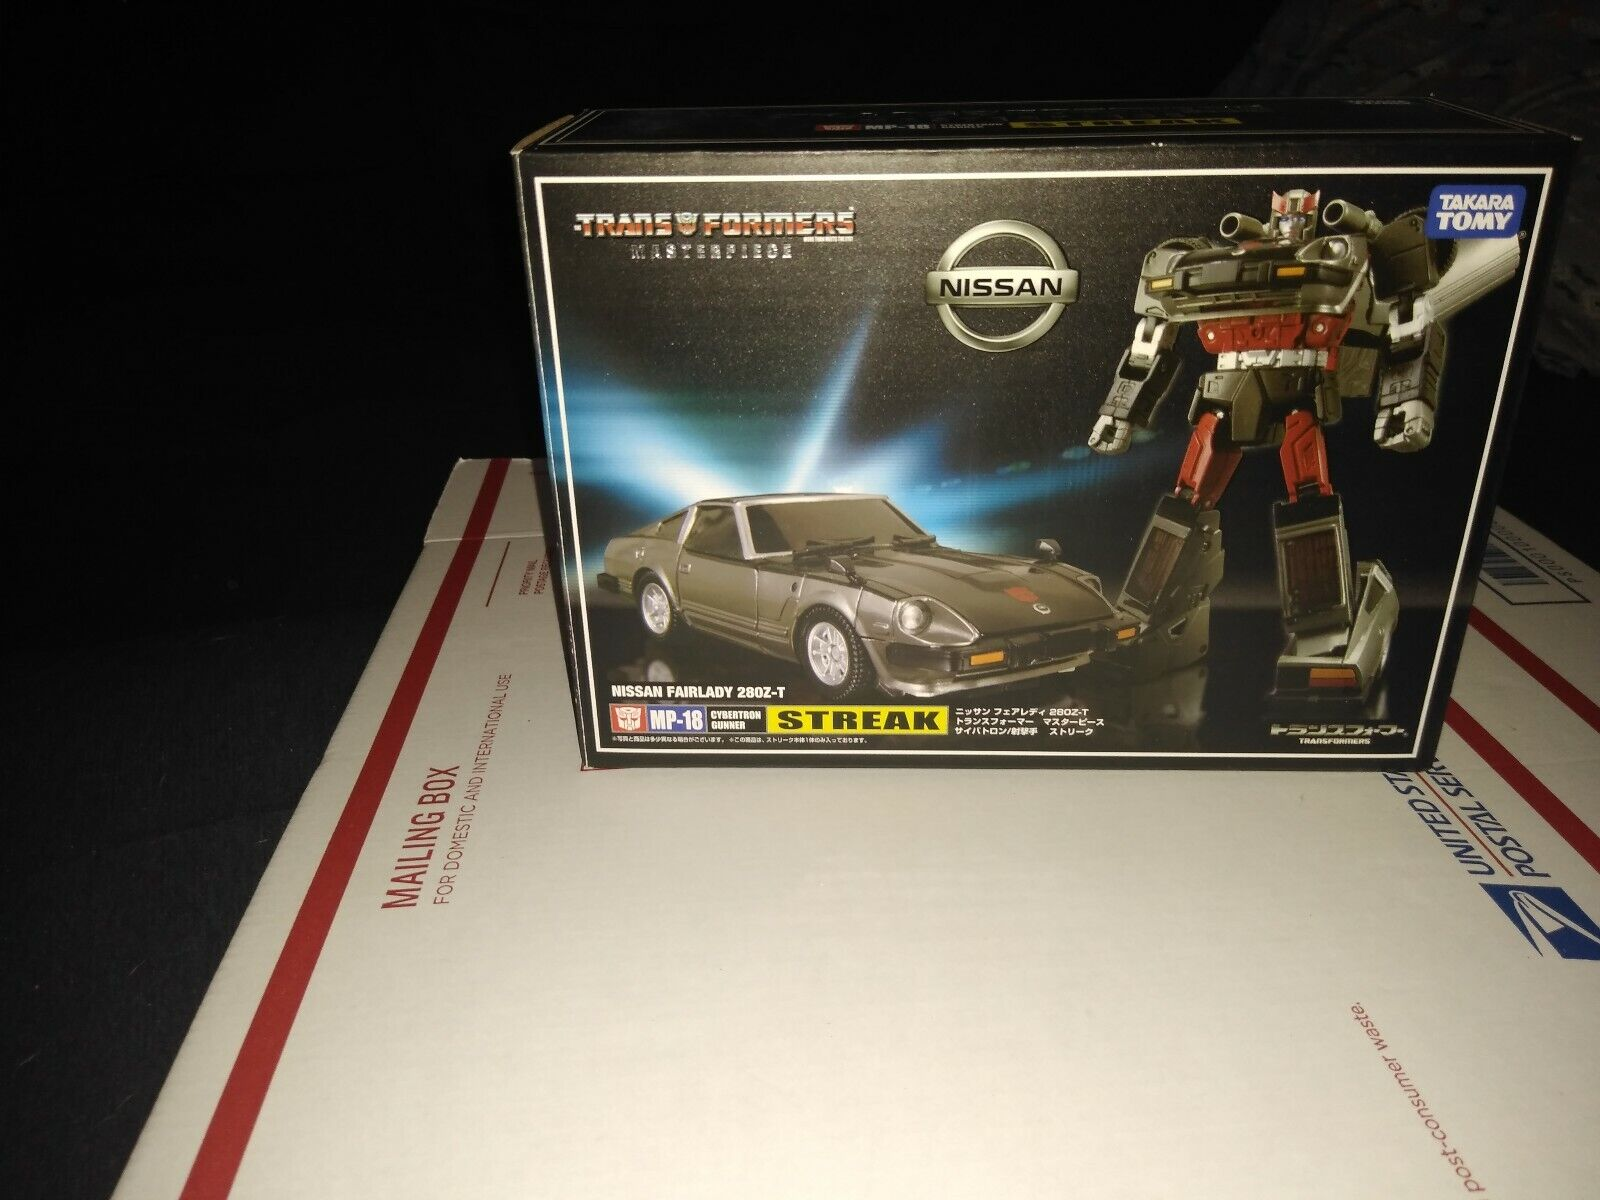 Transformers MP 18 Masterpiece Streak with scatola Takara Authentic